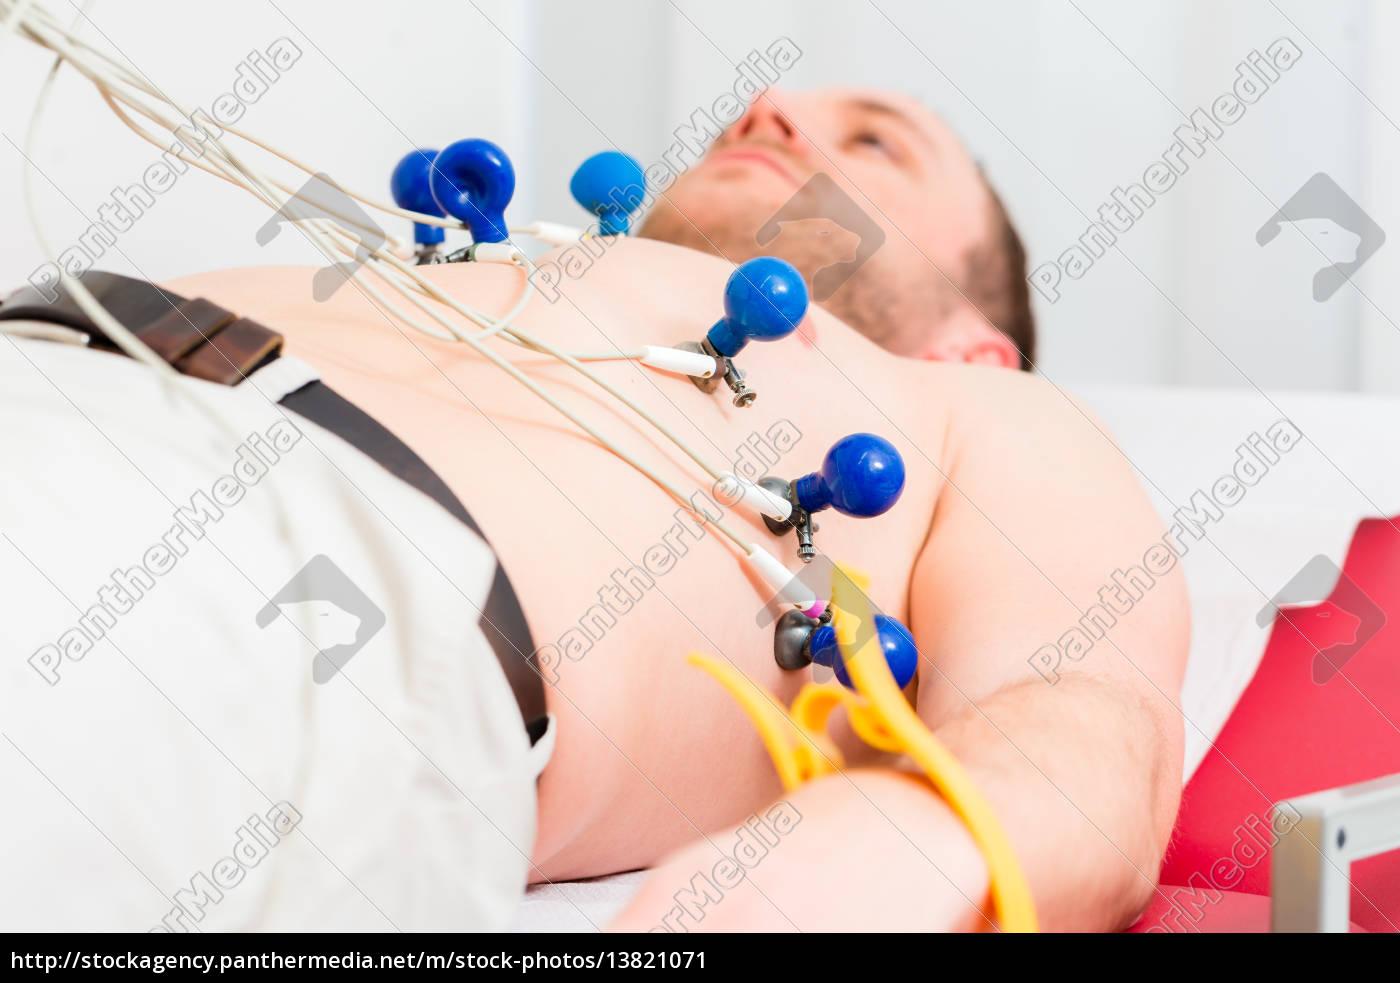 patient, at, ecg, in, medical, practice - 13821071